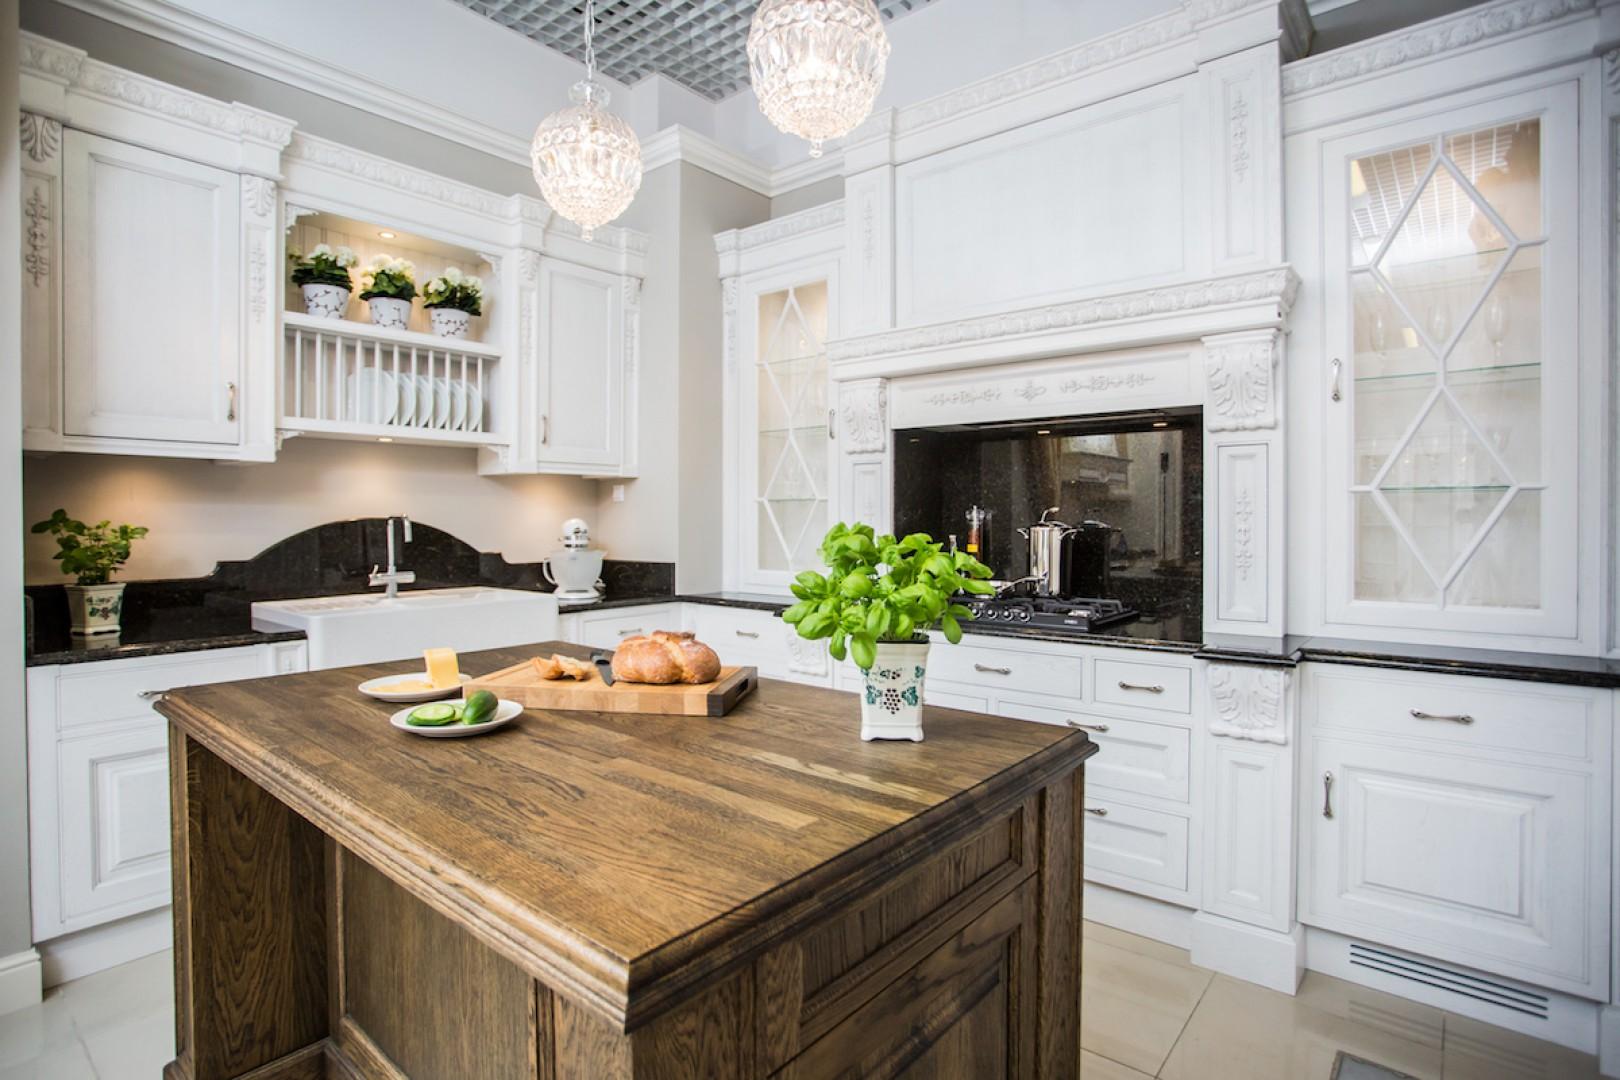 Kuchnia Sewilla z litego drewna. Fot. Arino House